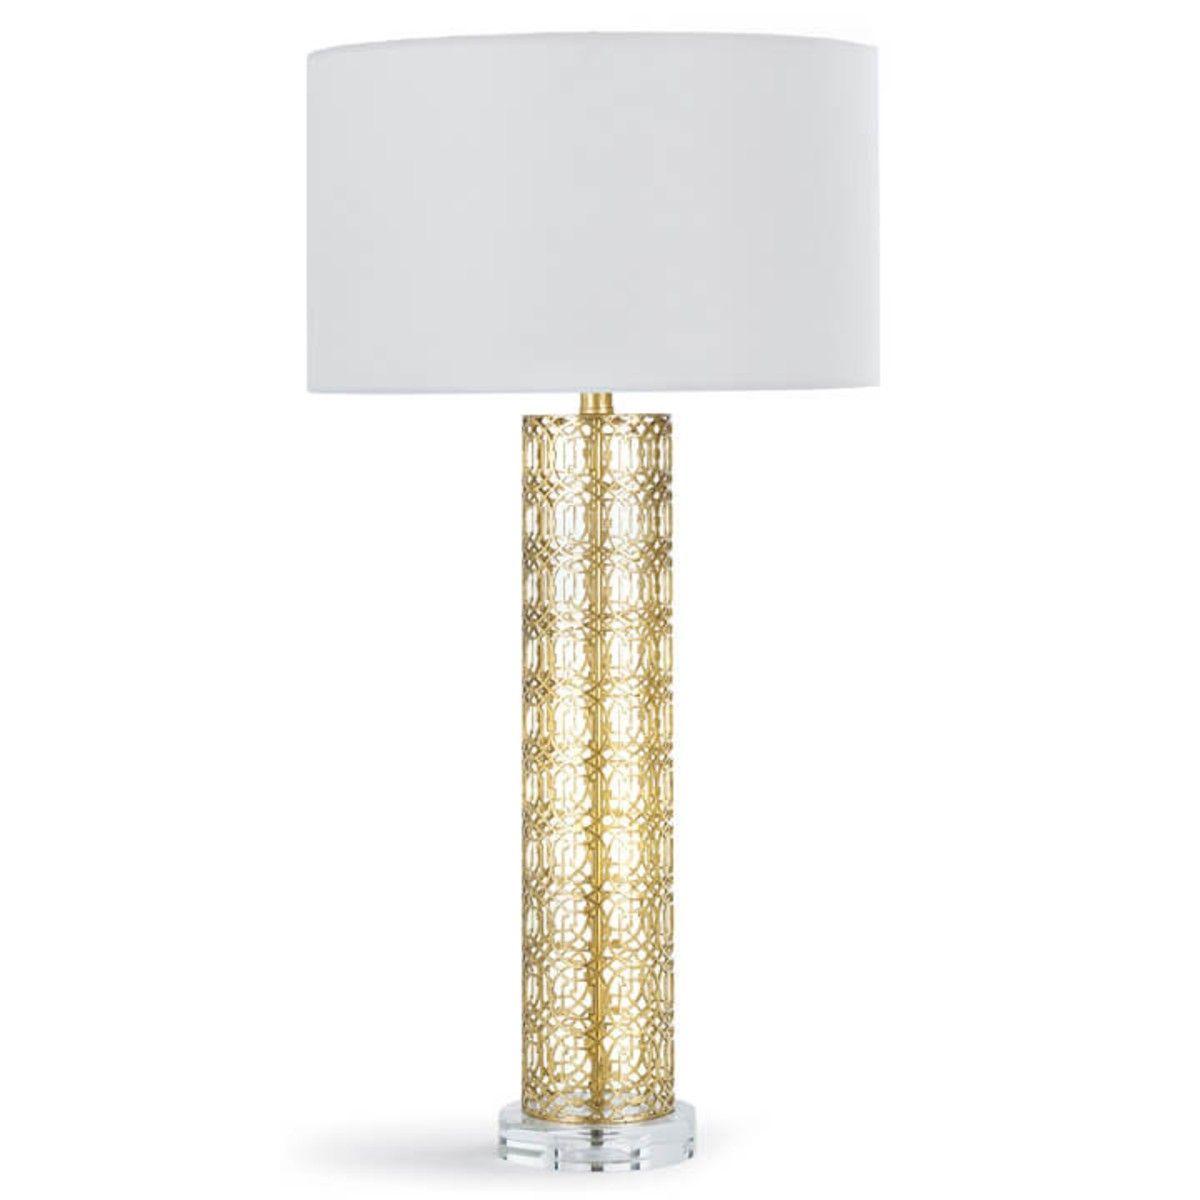 lamps brass camden soft lamp design lighting natural andrew lantern regina